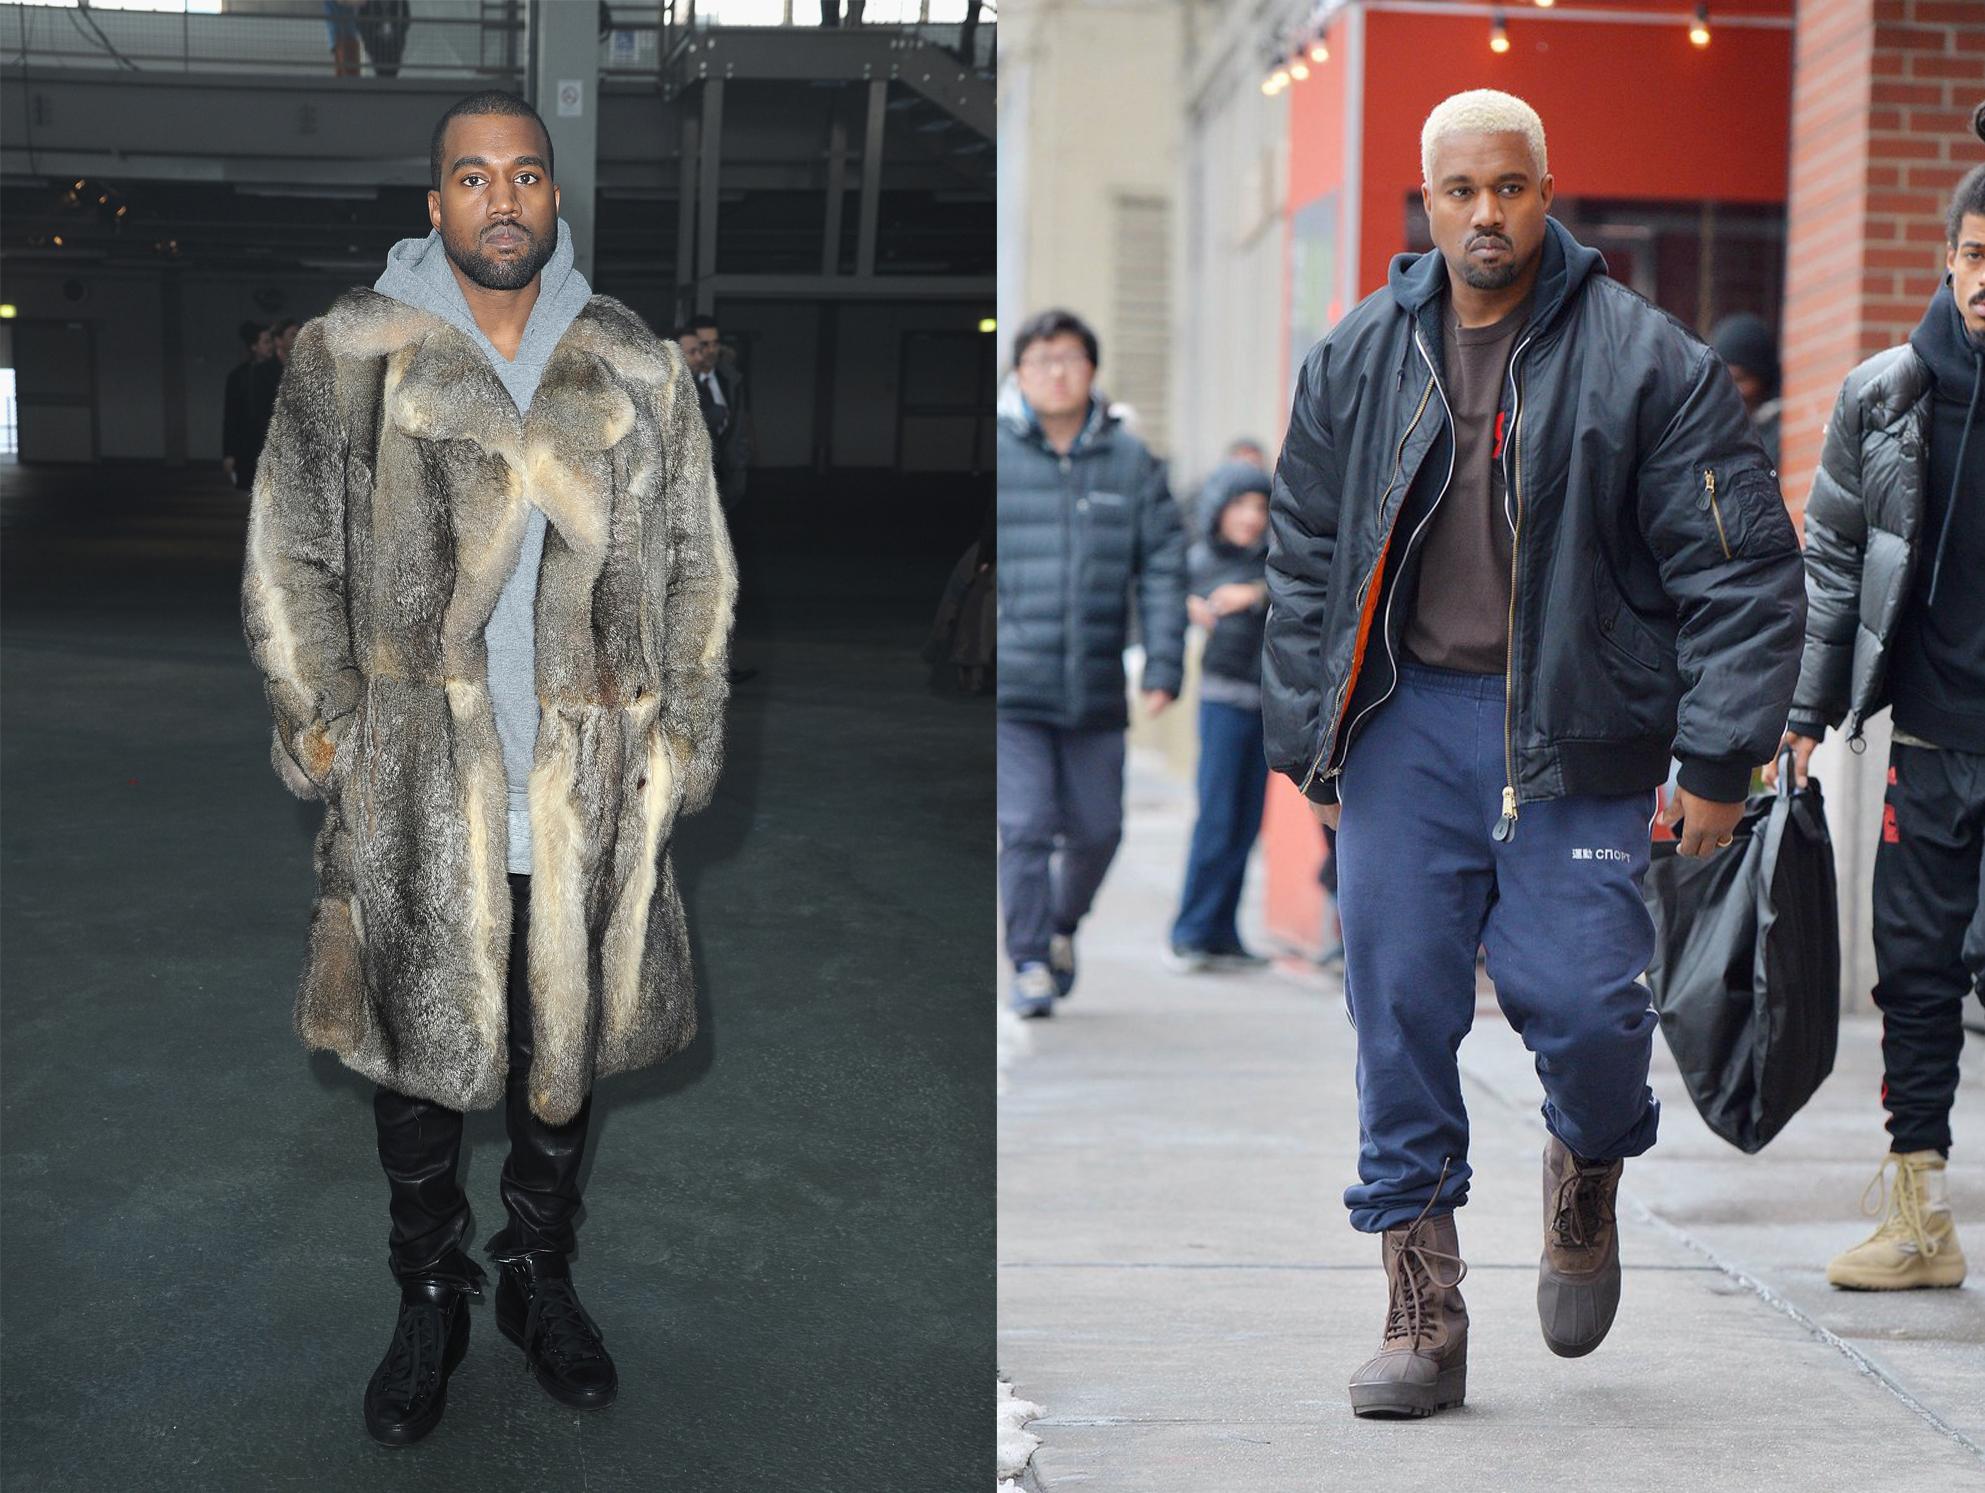 phong cach thoi trang nam - elle man - Kanye West a